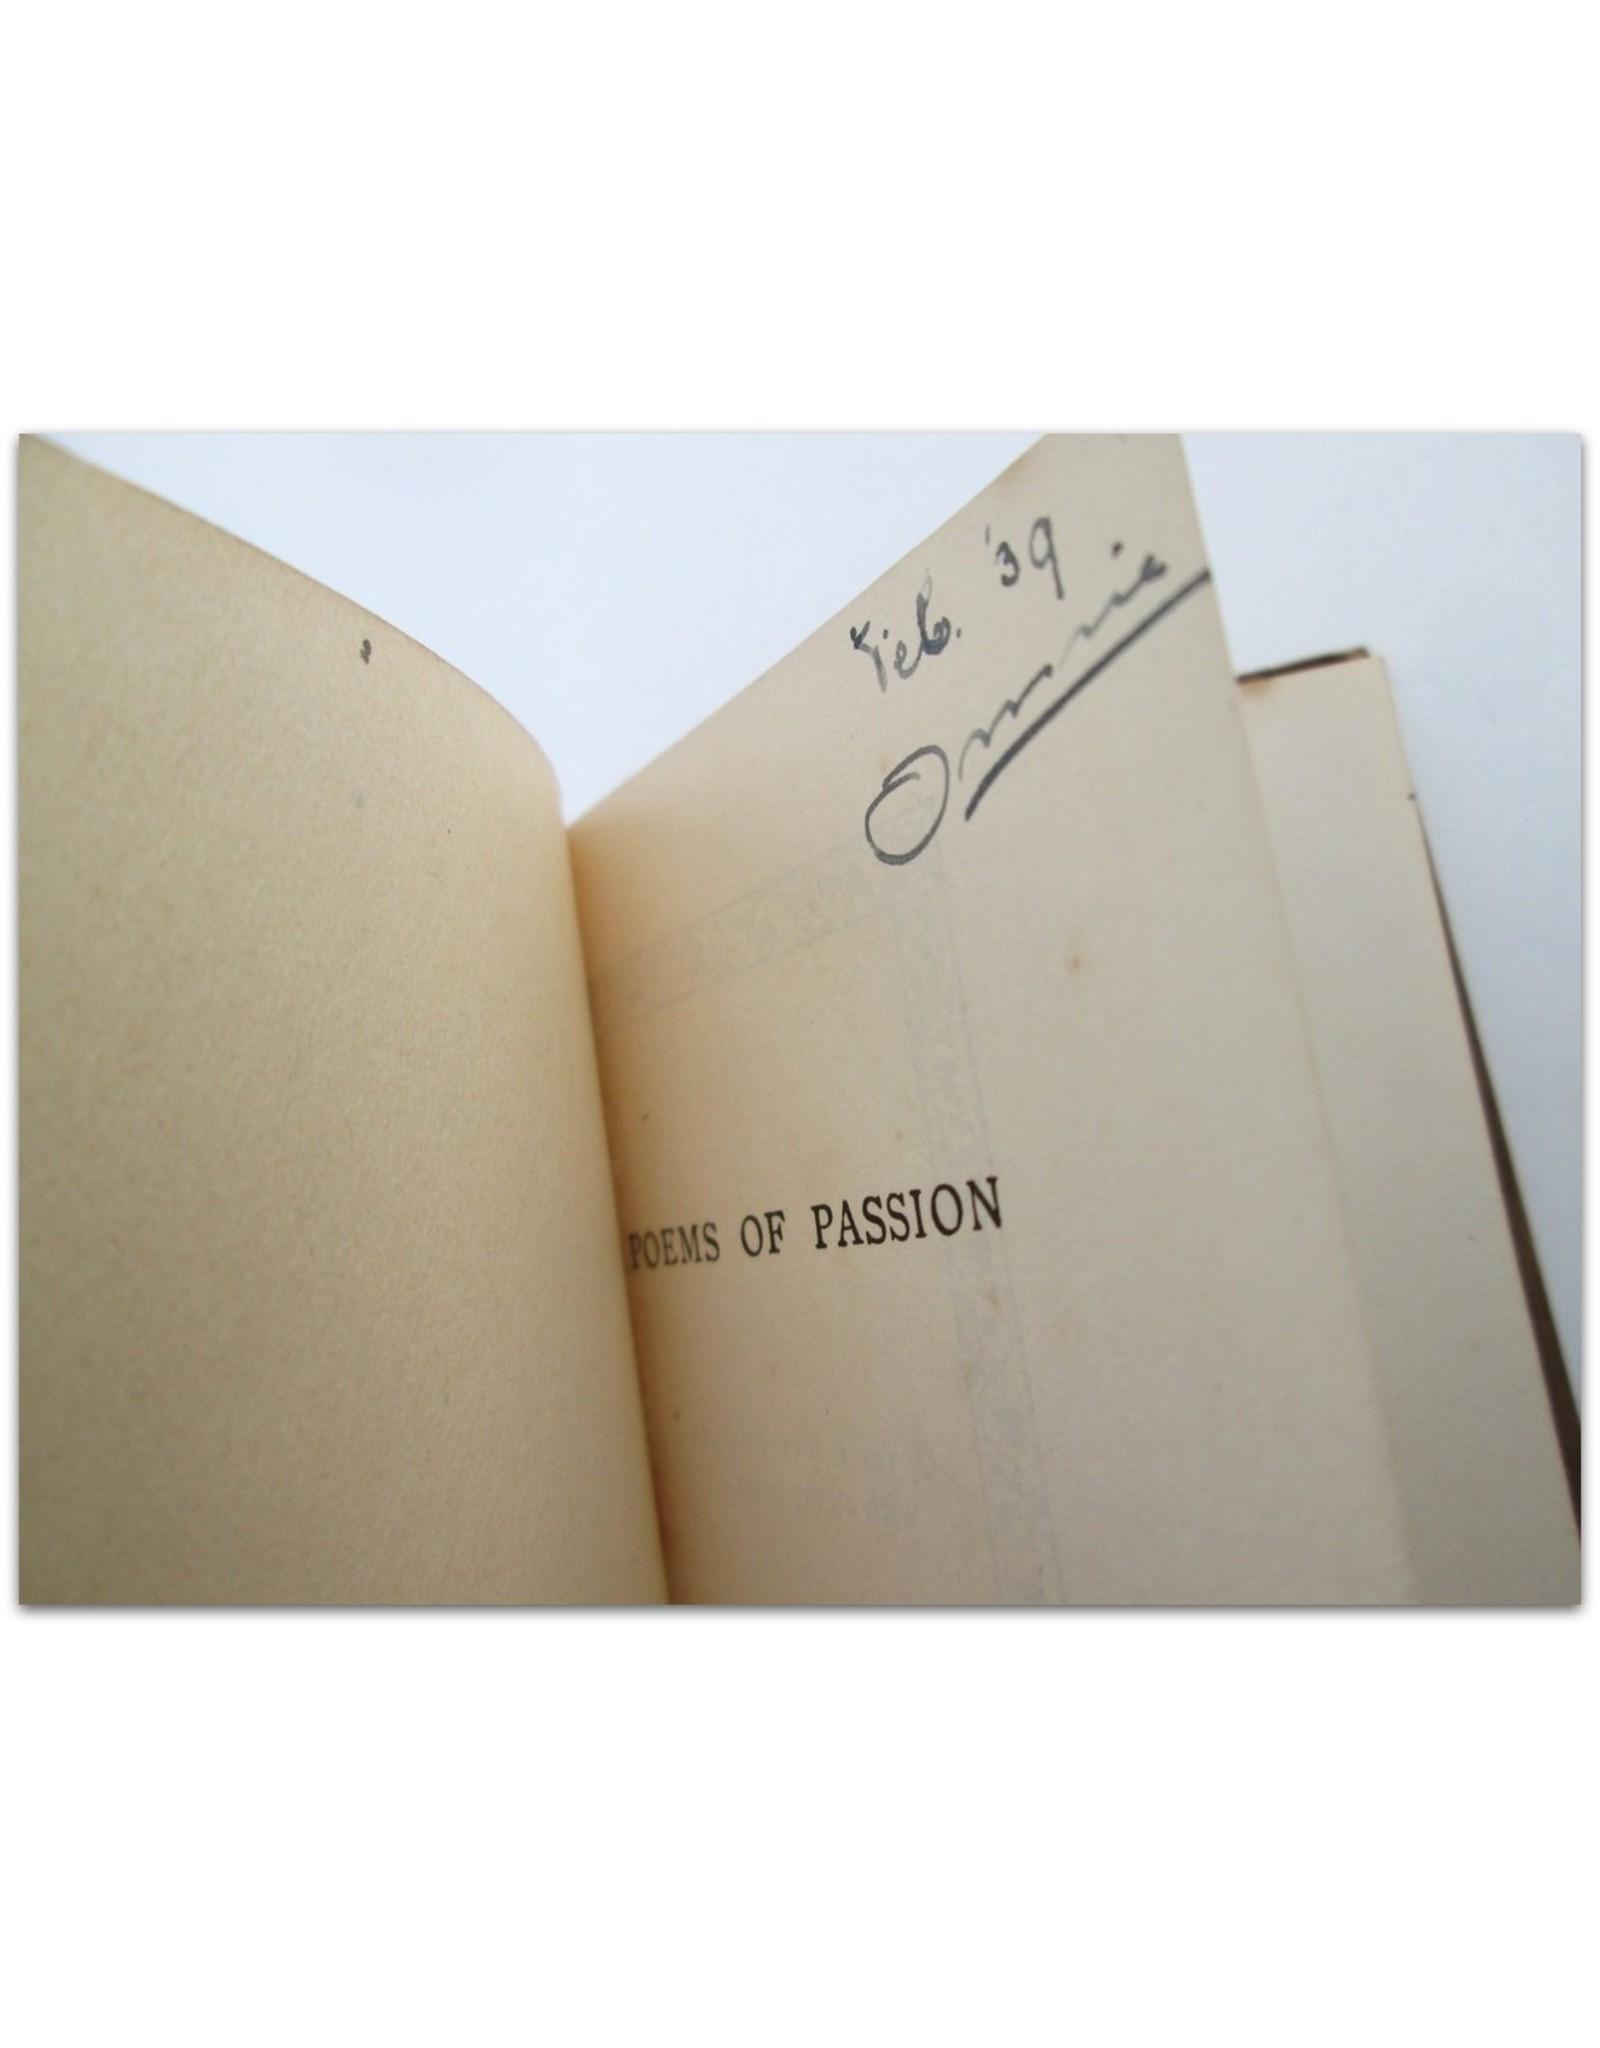 Ella Wheeler Wilcox - Poems of Passion